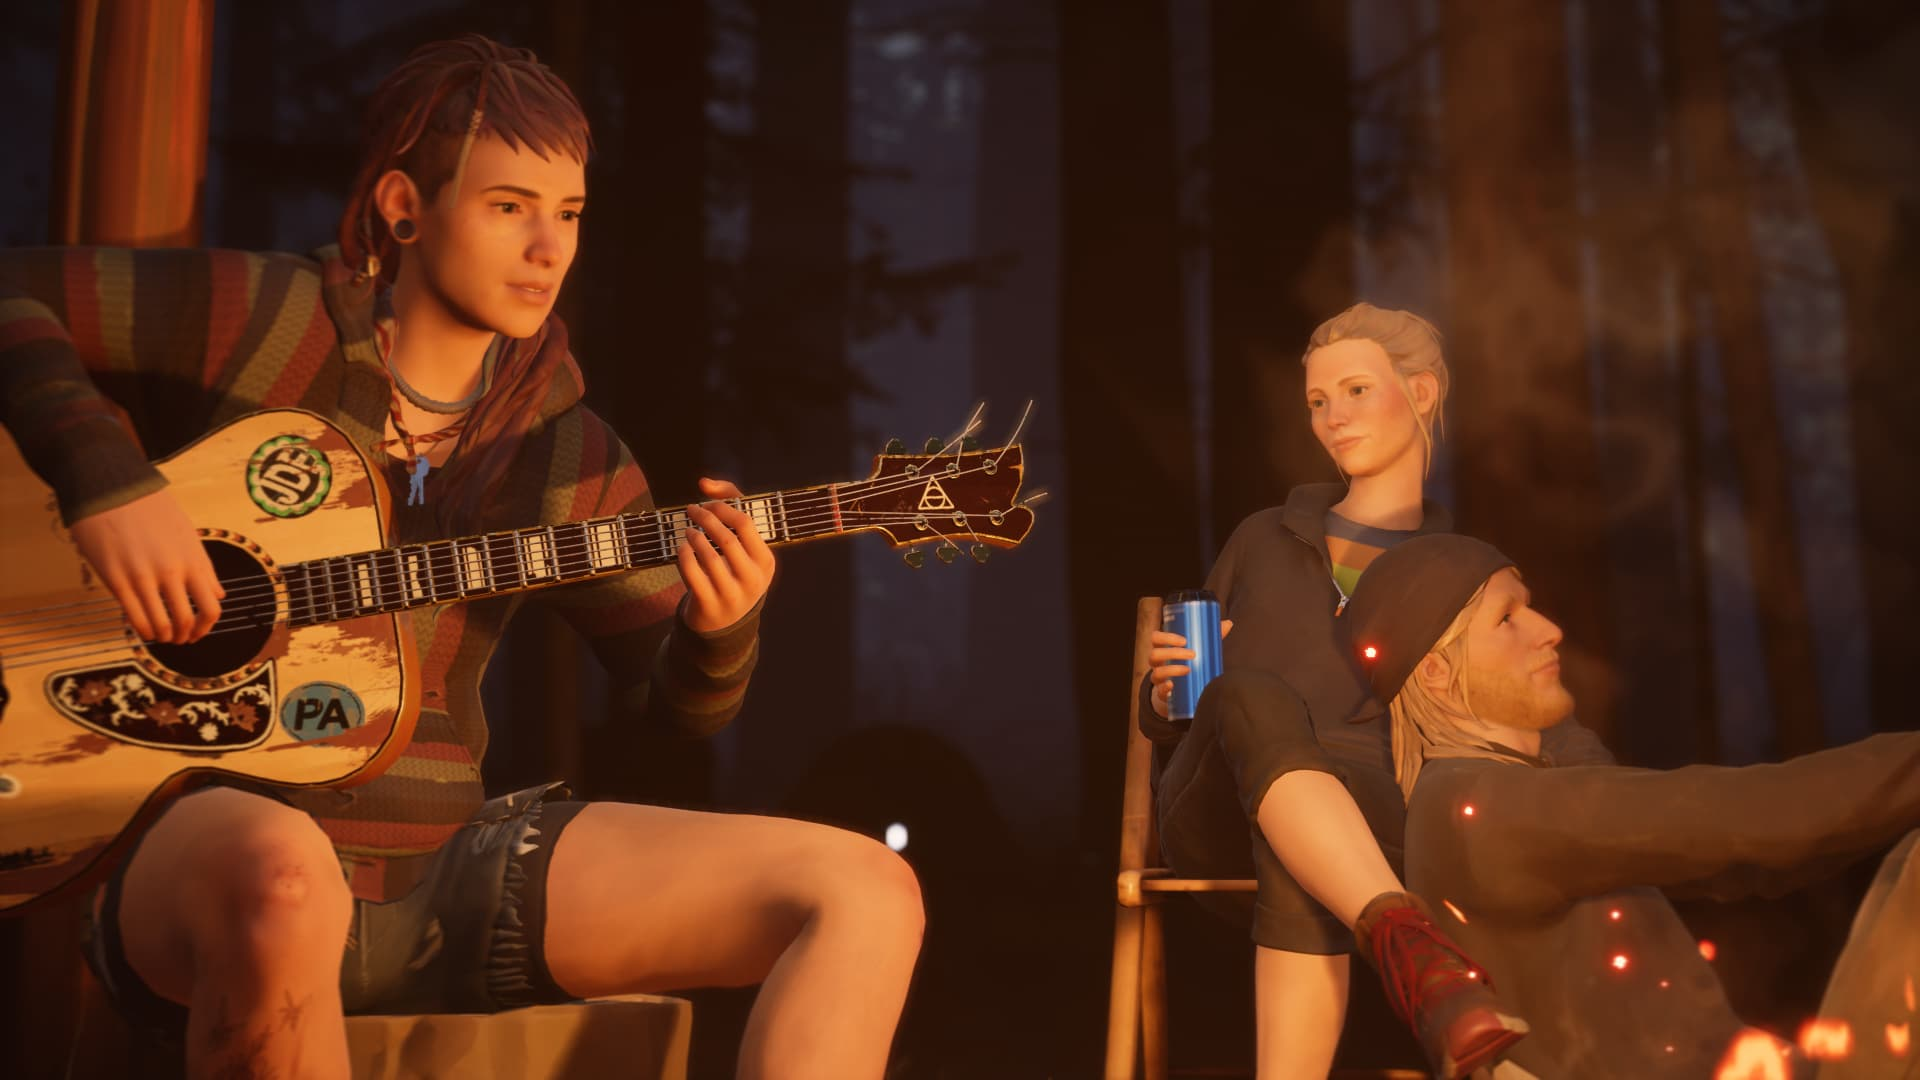 Análisis de Life is Strange 2: Episodio 3 - Xbox One 1